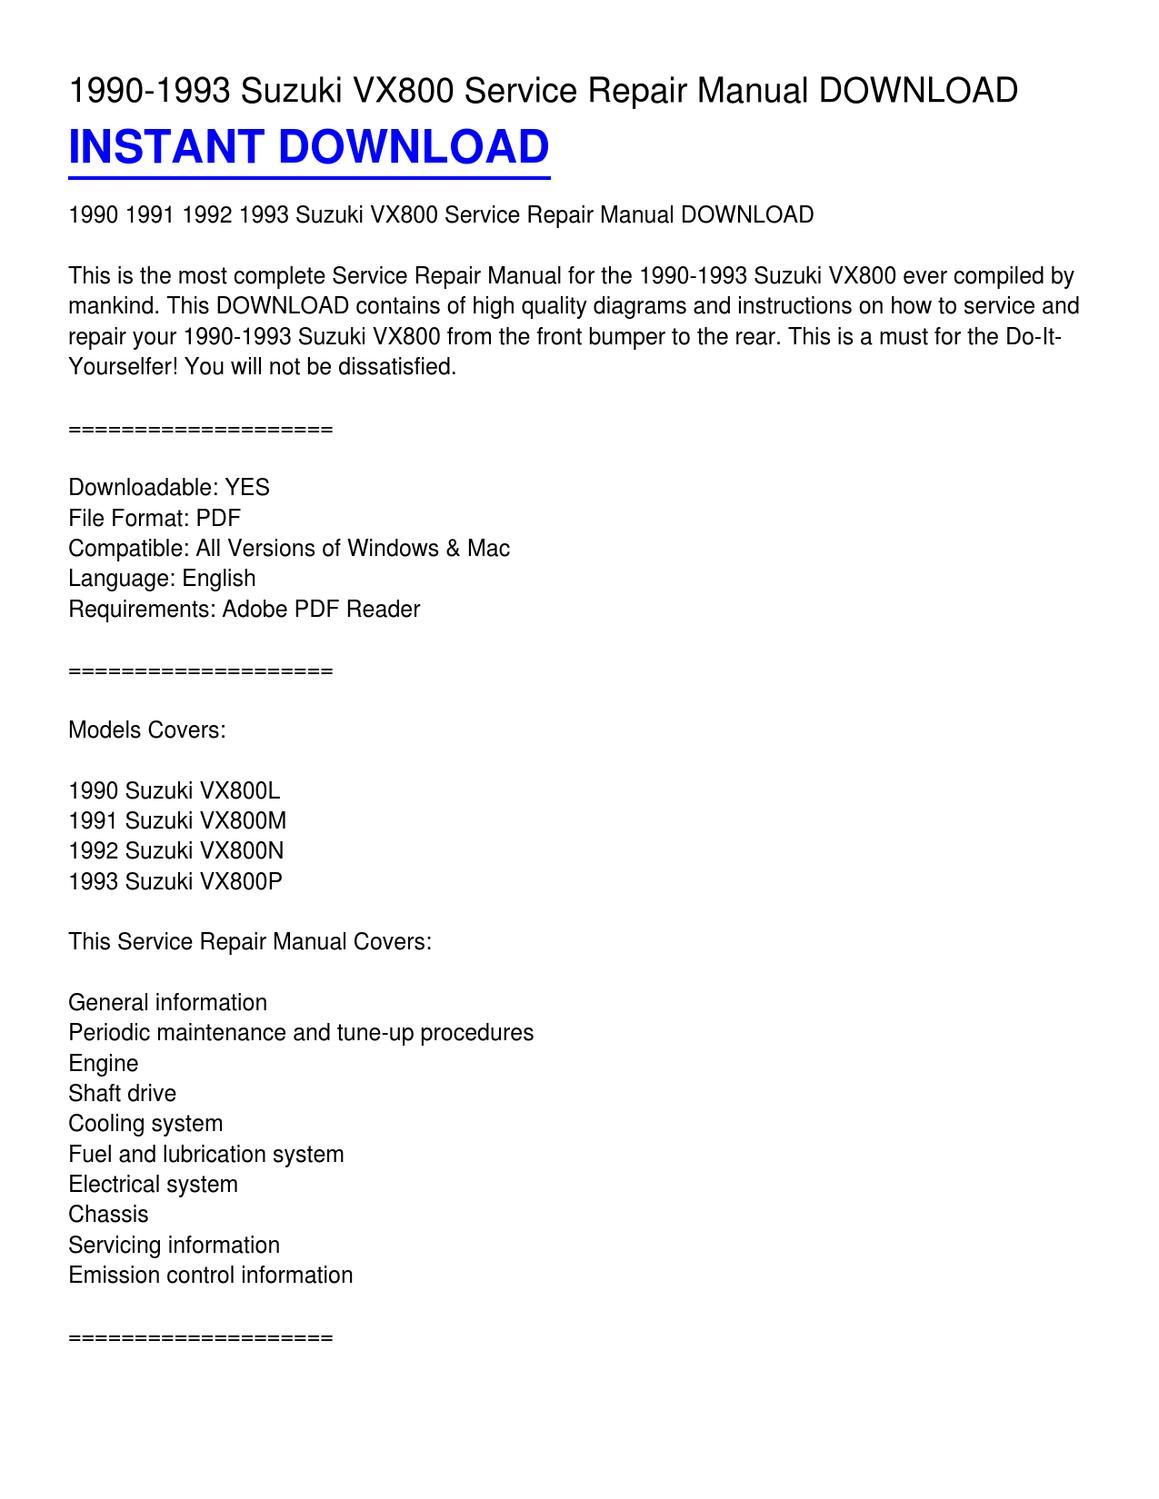 1990 1993 Suzuki Vx800 Service Repair Manual Download By Michael Peck Issuu